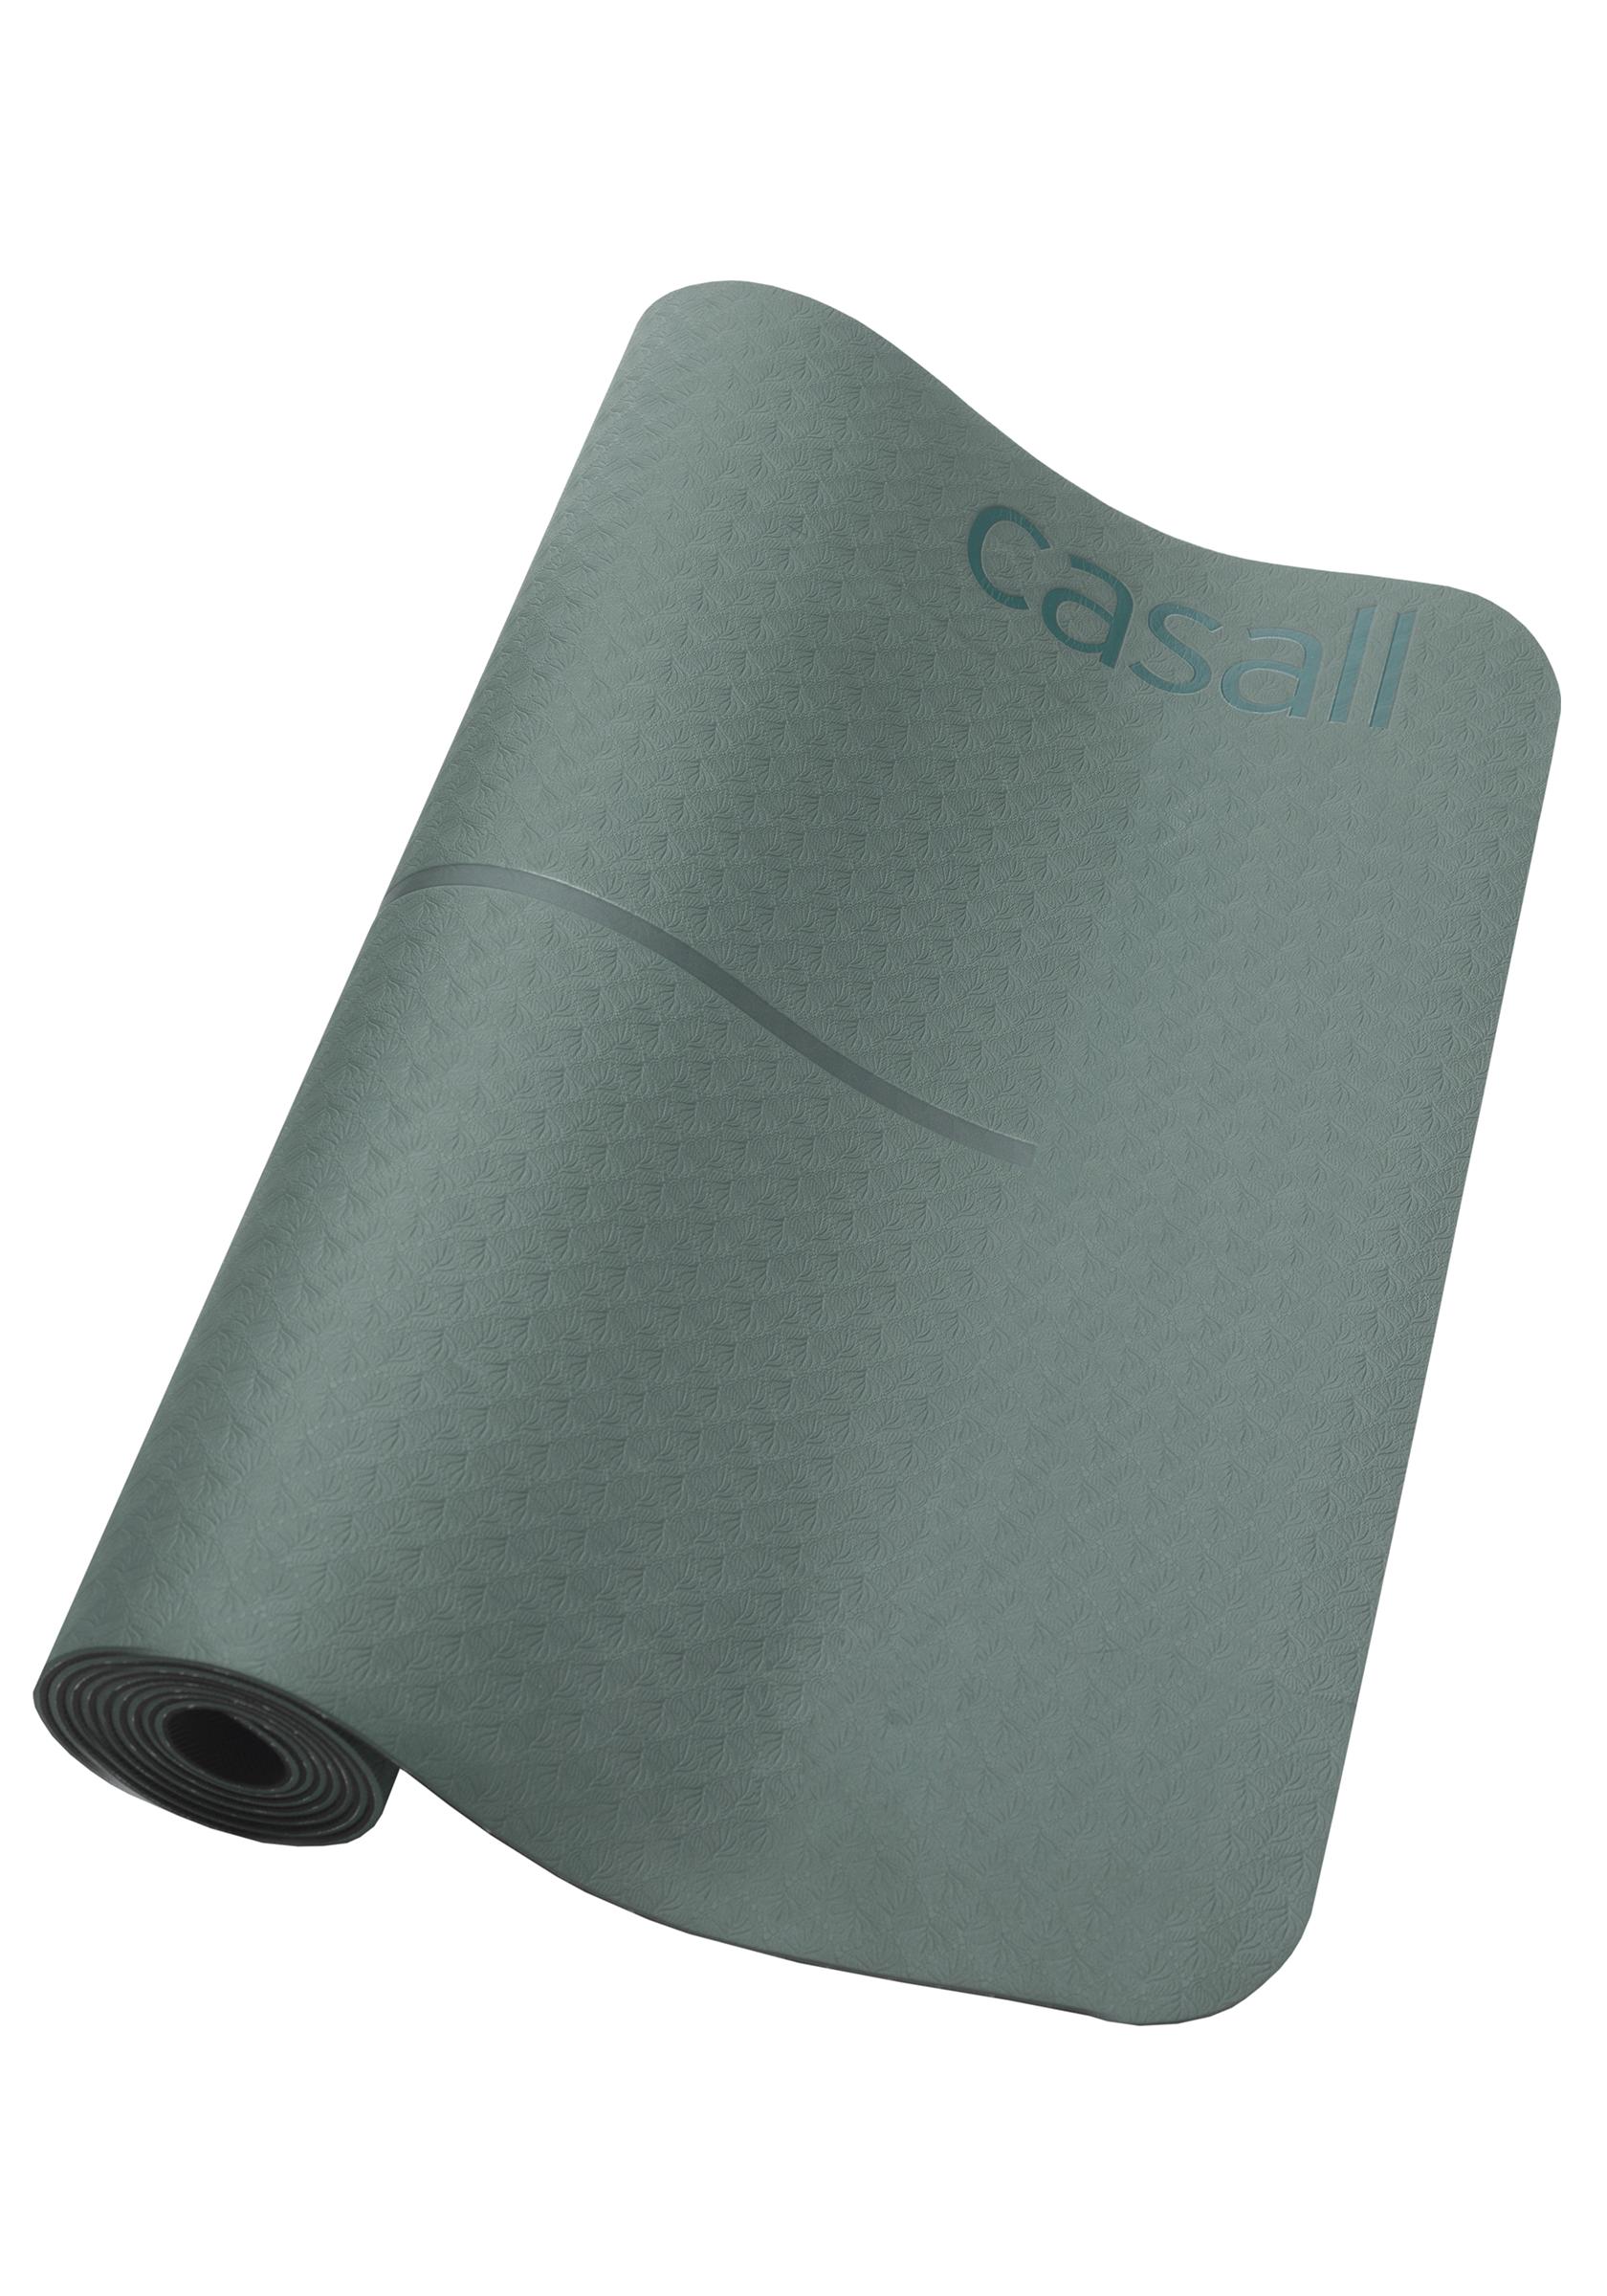 Yoga mat position 4mm - Khaki green/black